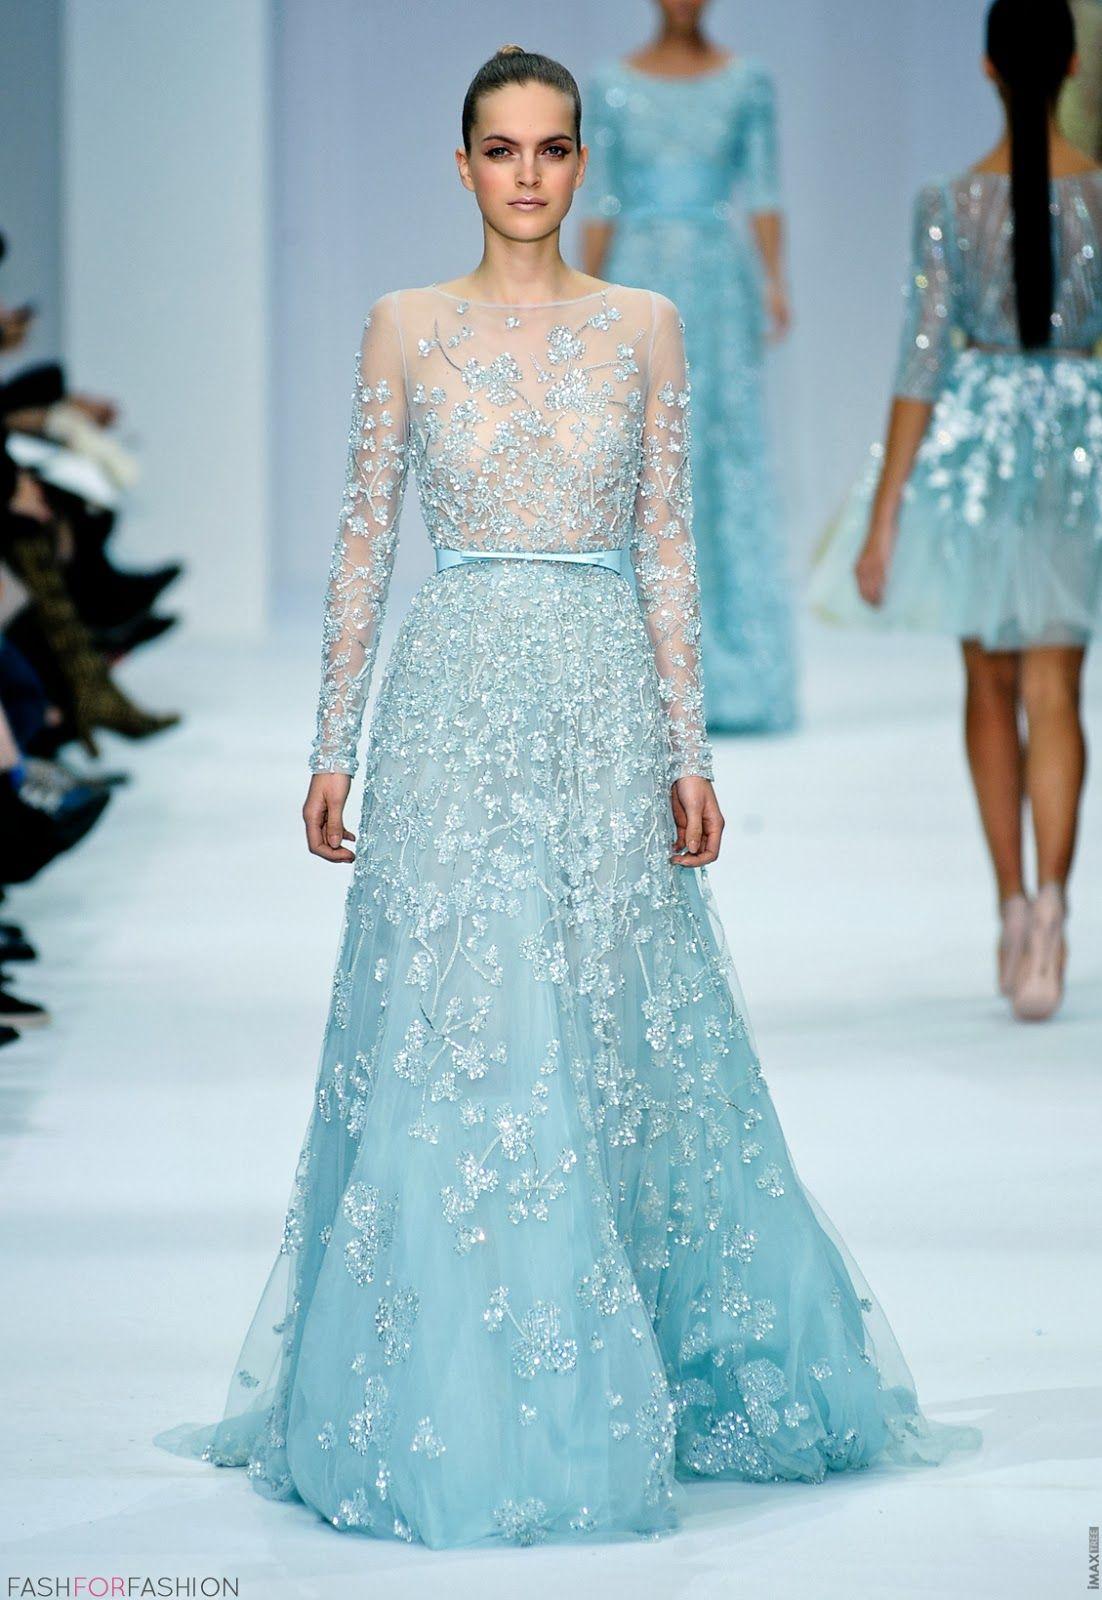 Elie Saab Blue Wedding Dress   by Elie Saab   Special Day ...